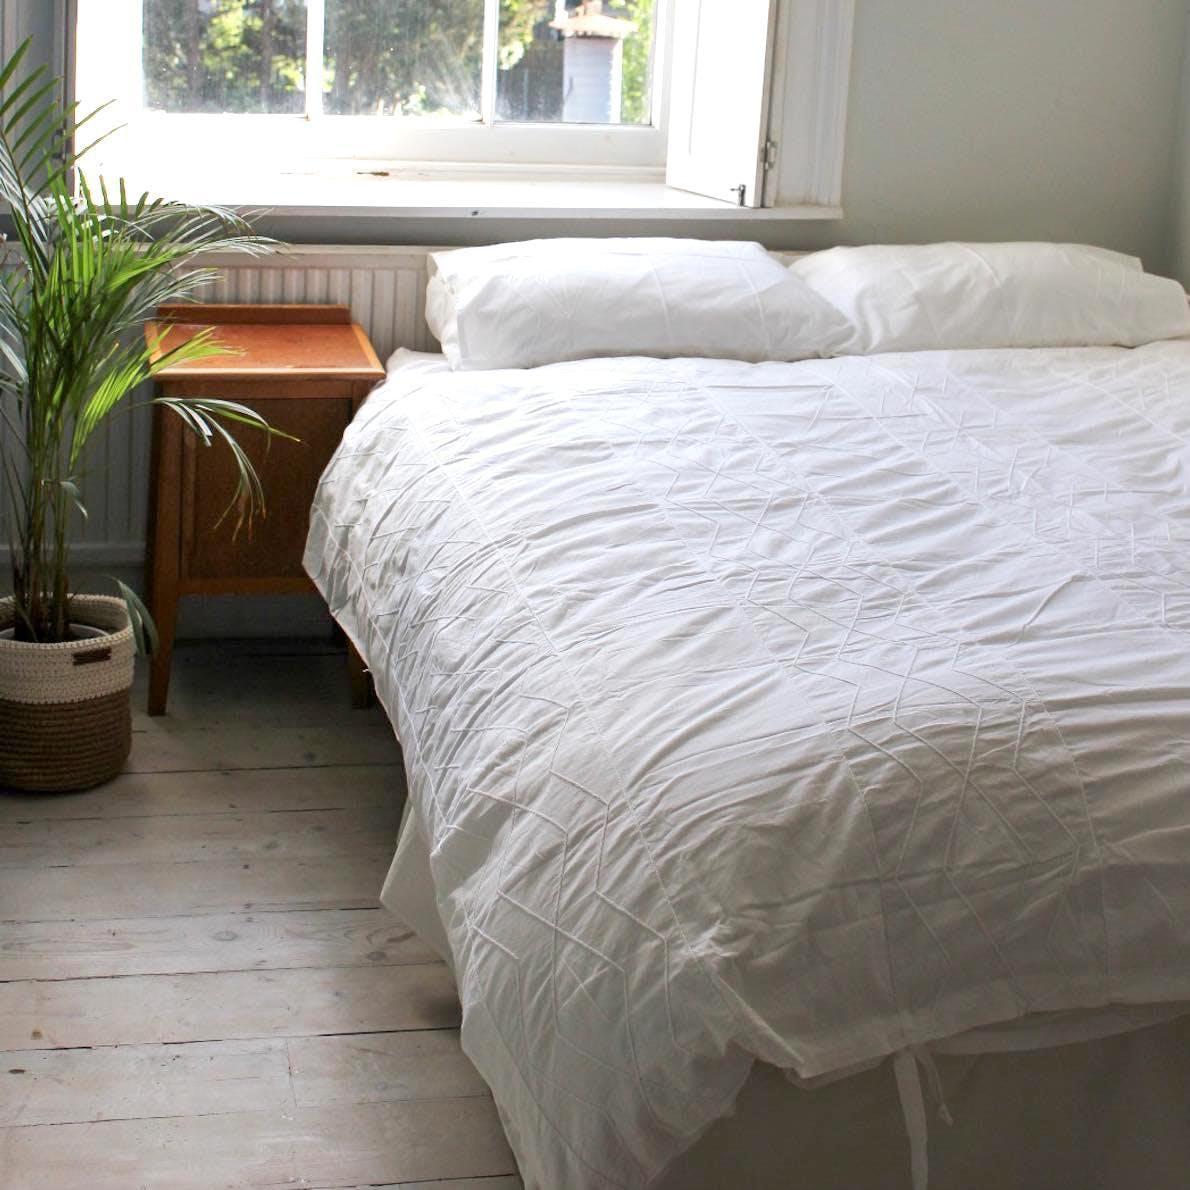 a bedding set